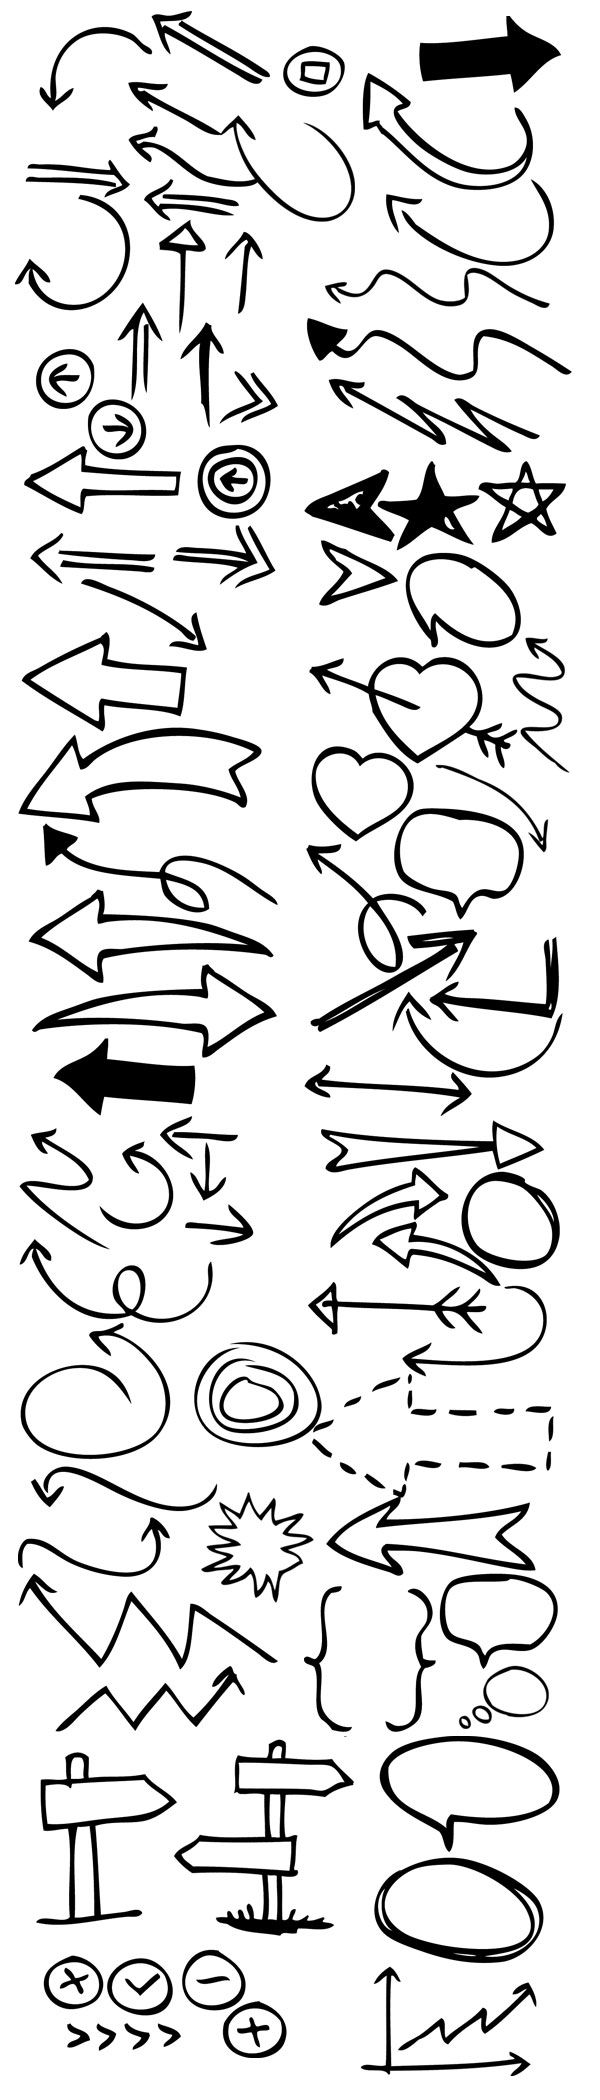 handdrawn-arrow-symbols-brushes